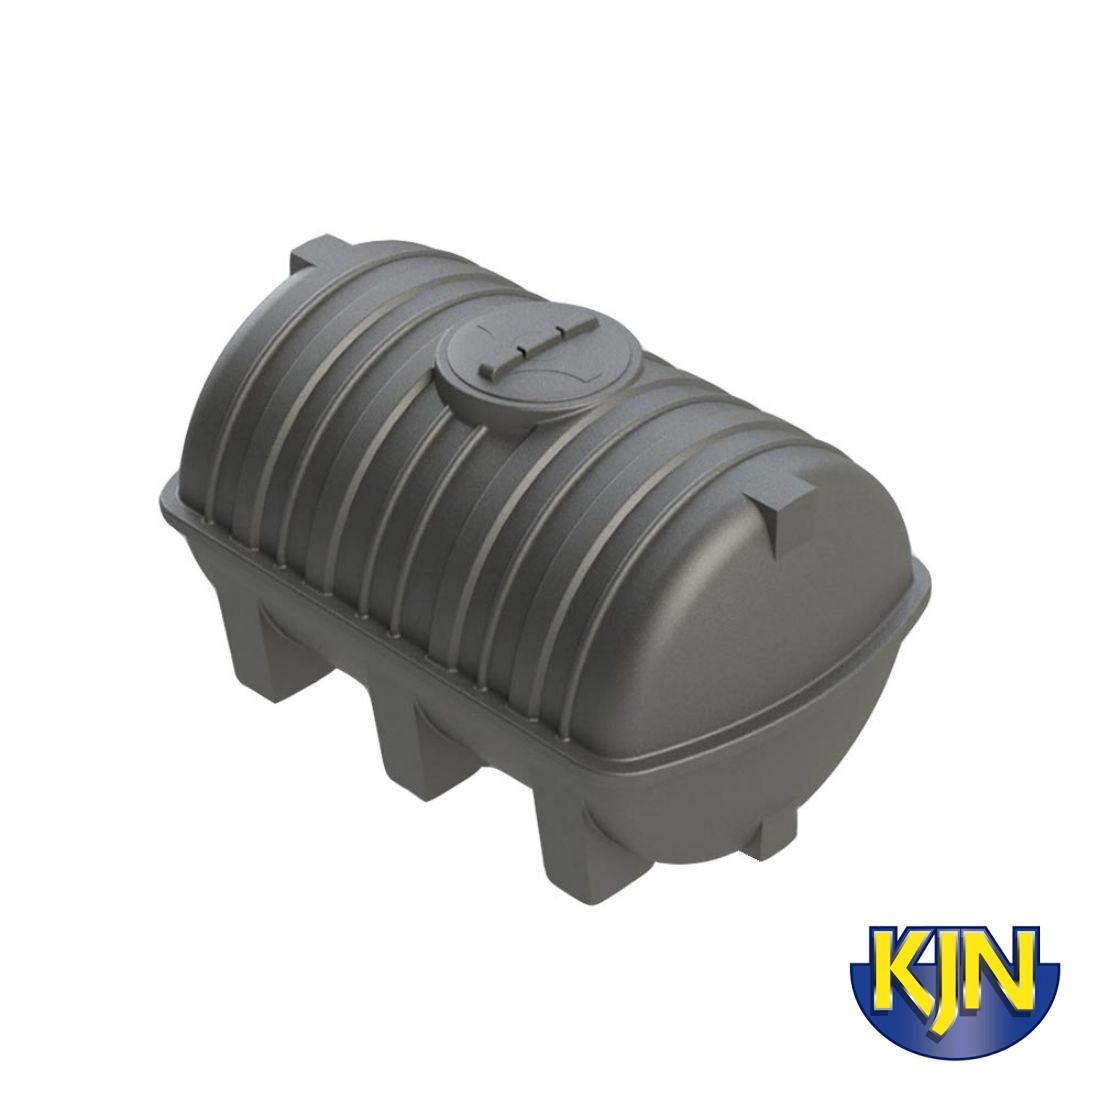 Enduramaxx 1,020 Litre Horizontal Static Potable WRAS Water Storage Tank